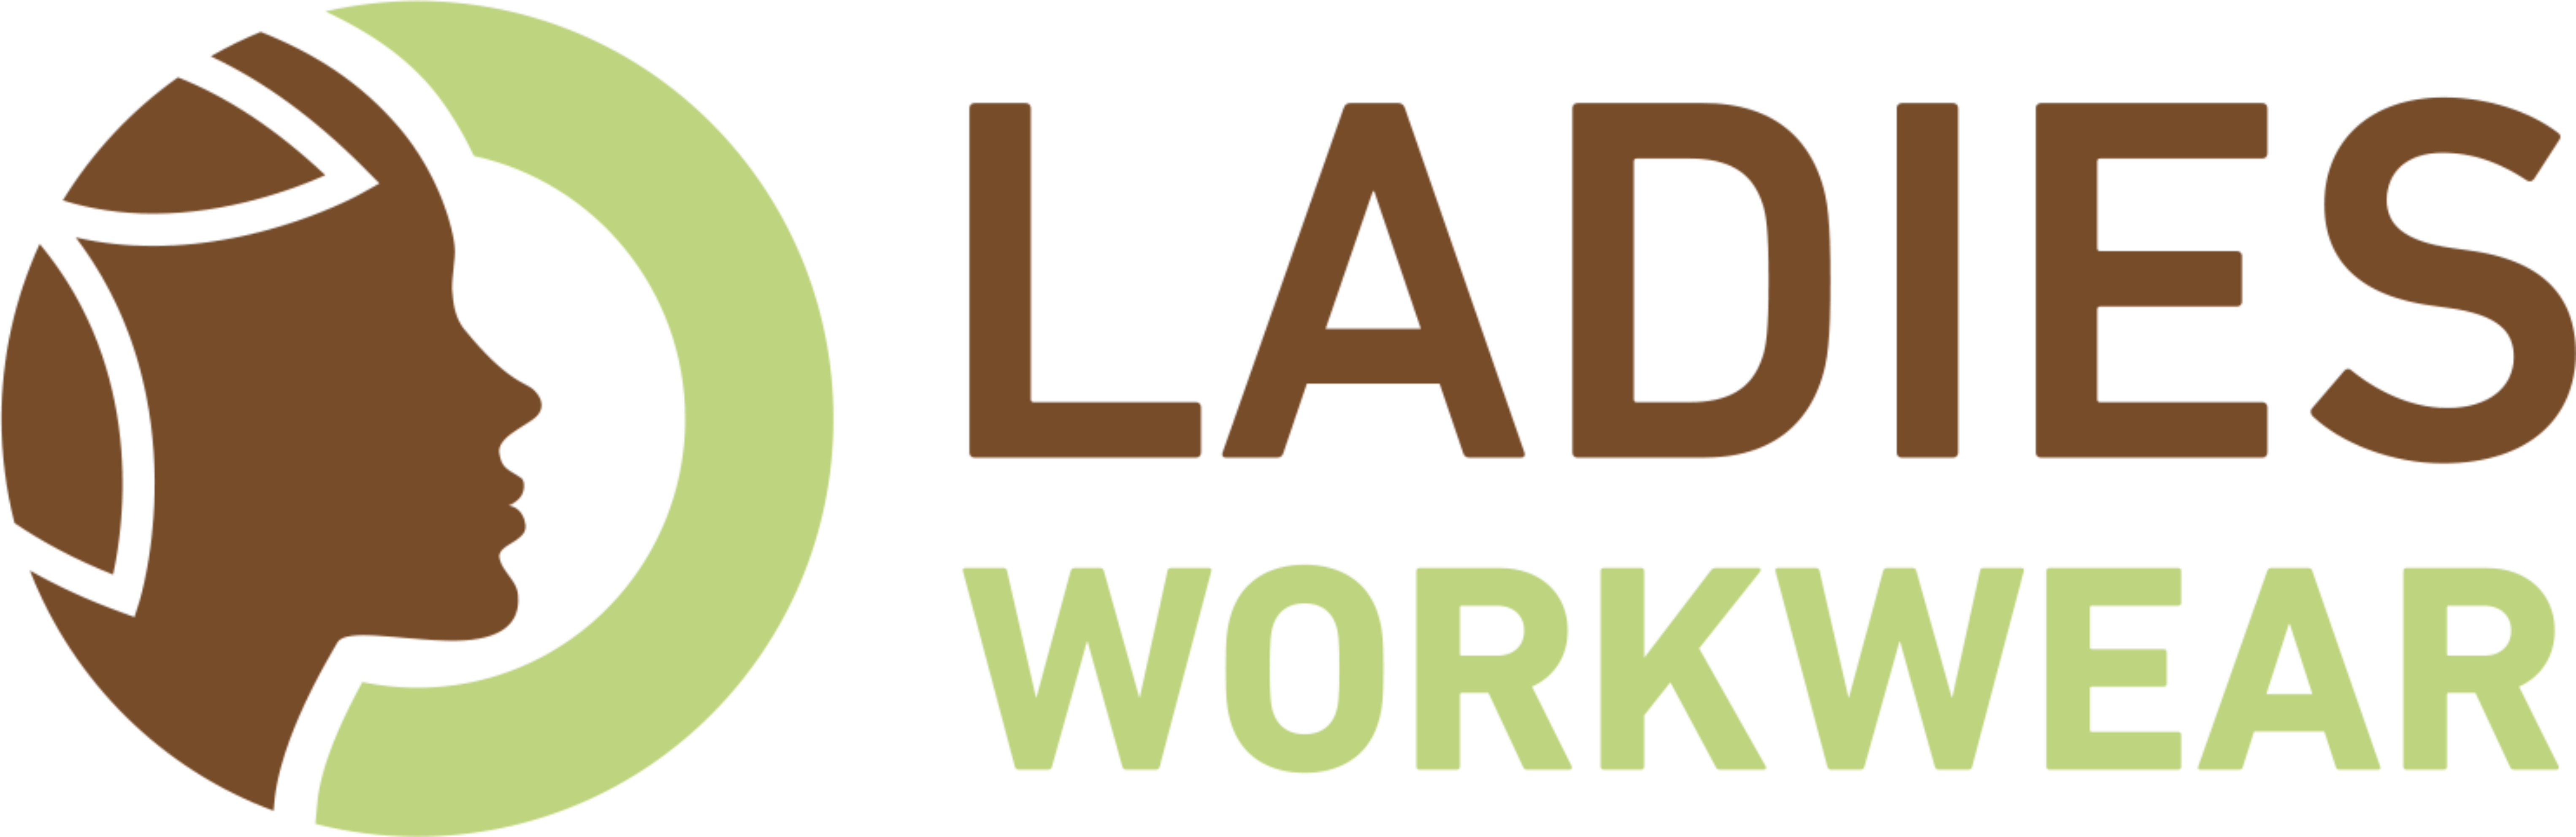 Ladies Workwear 744a15bedc